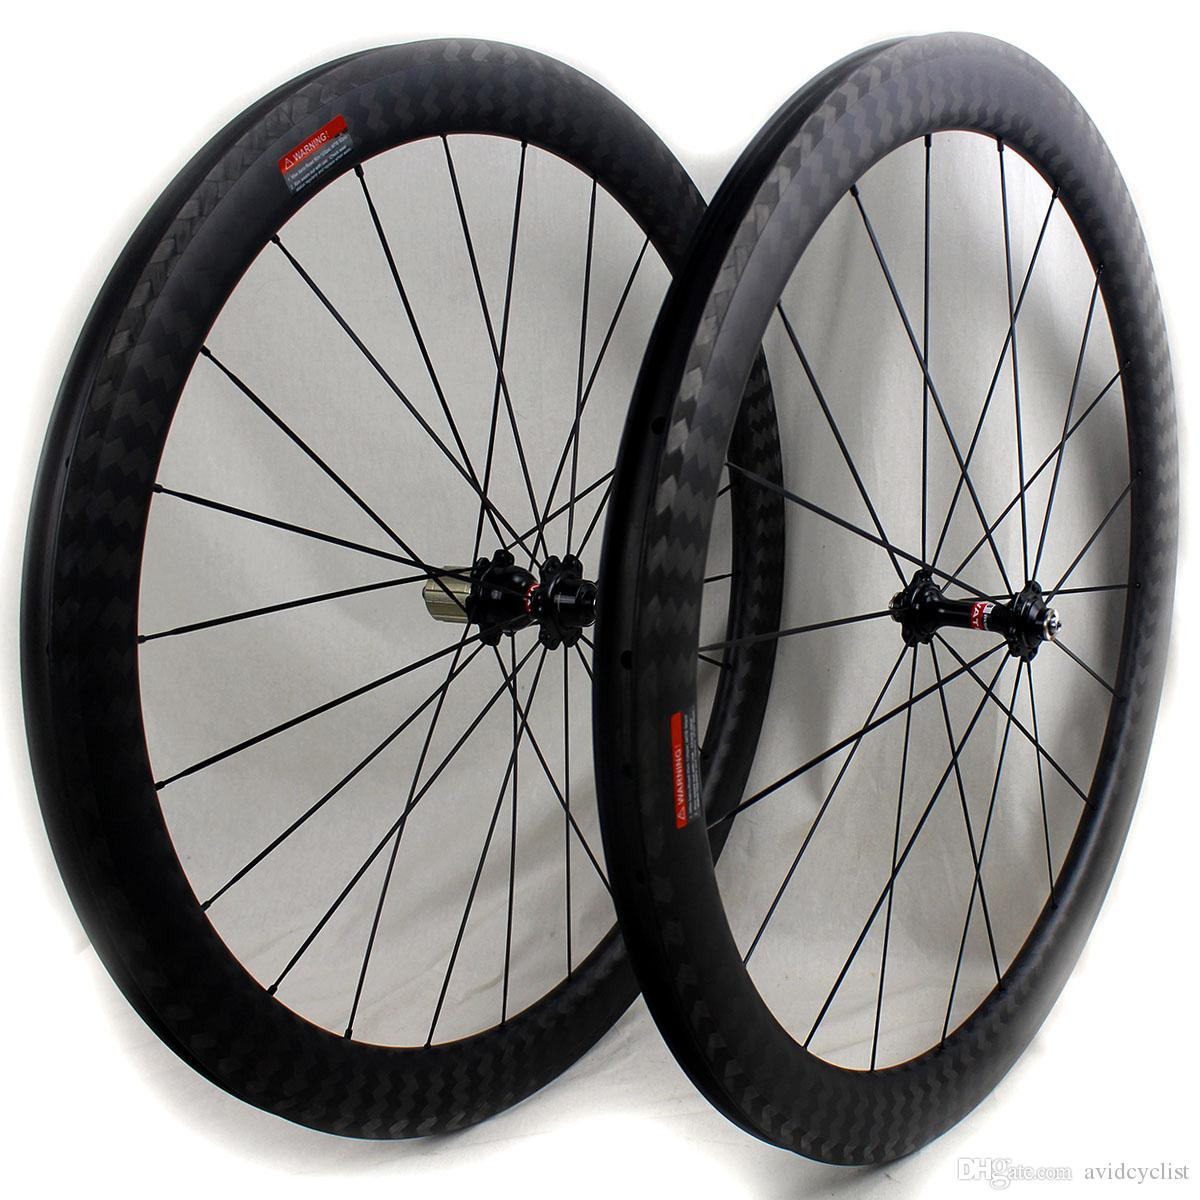 12K carbon fiber bike road wheels 50mm 700C basalt brake surface clincher tubular road bicycle racing wheelset rim width 25mm matt